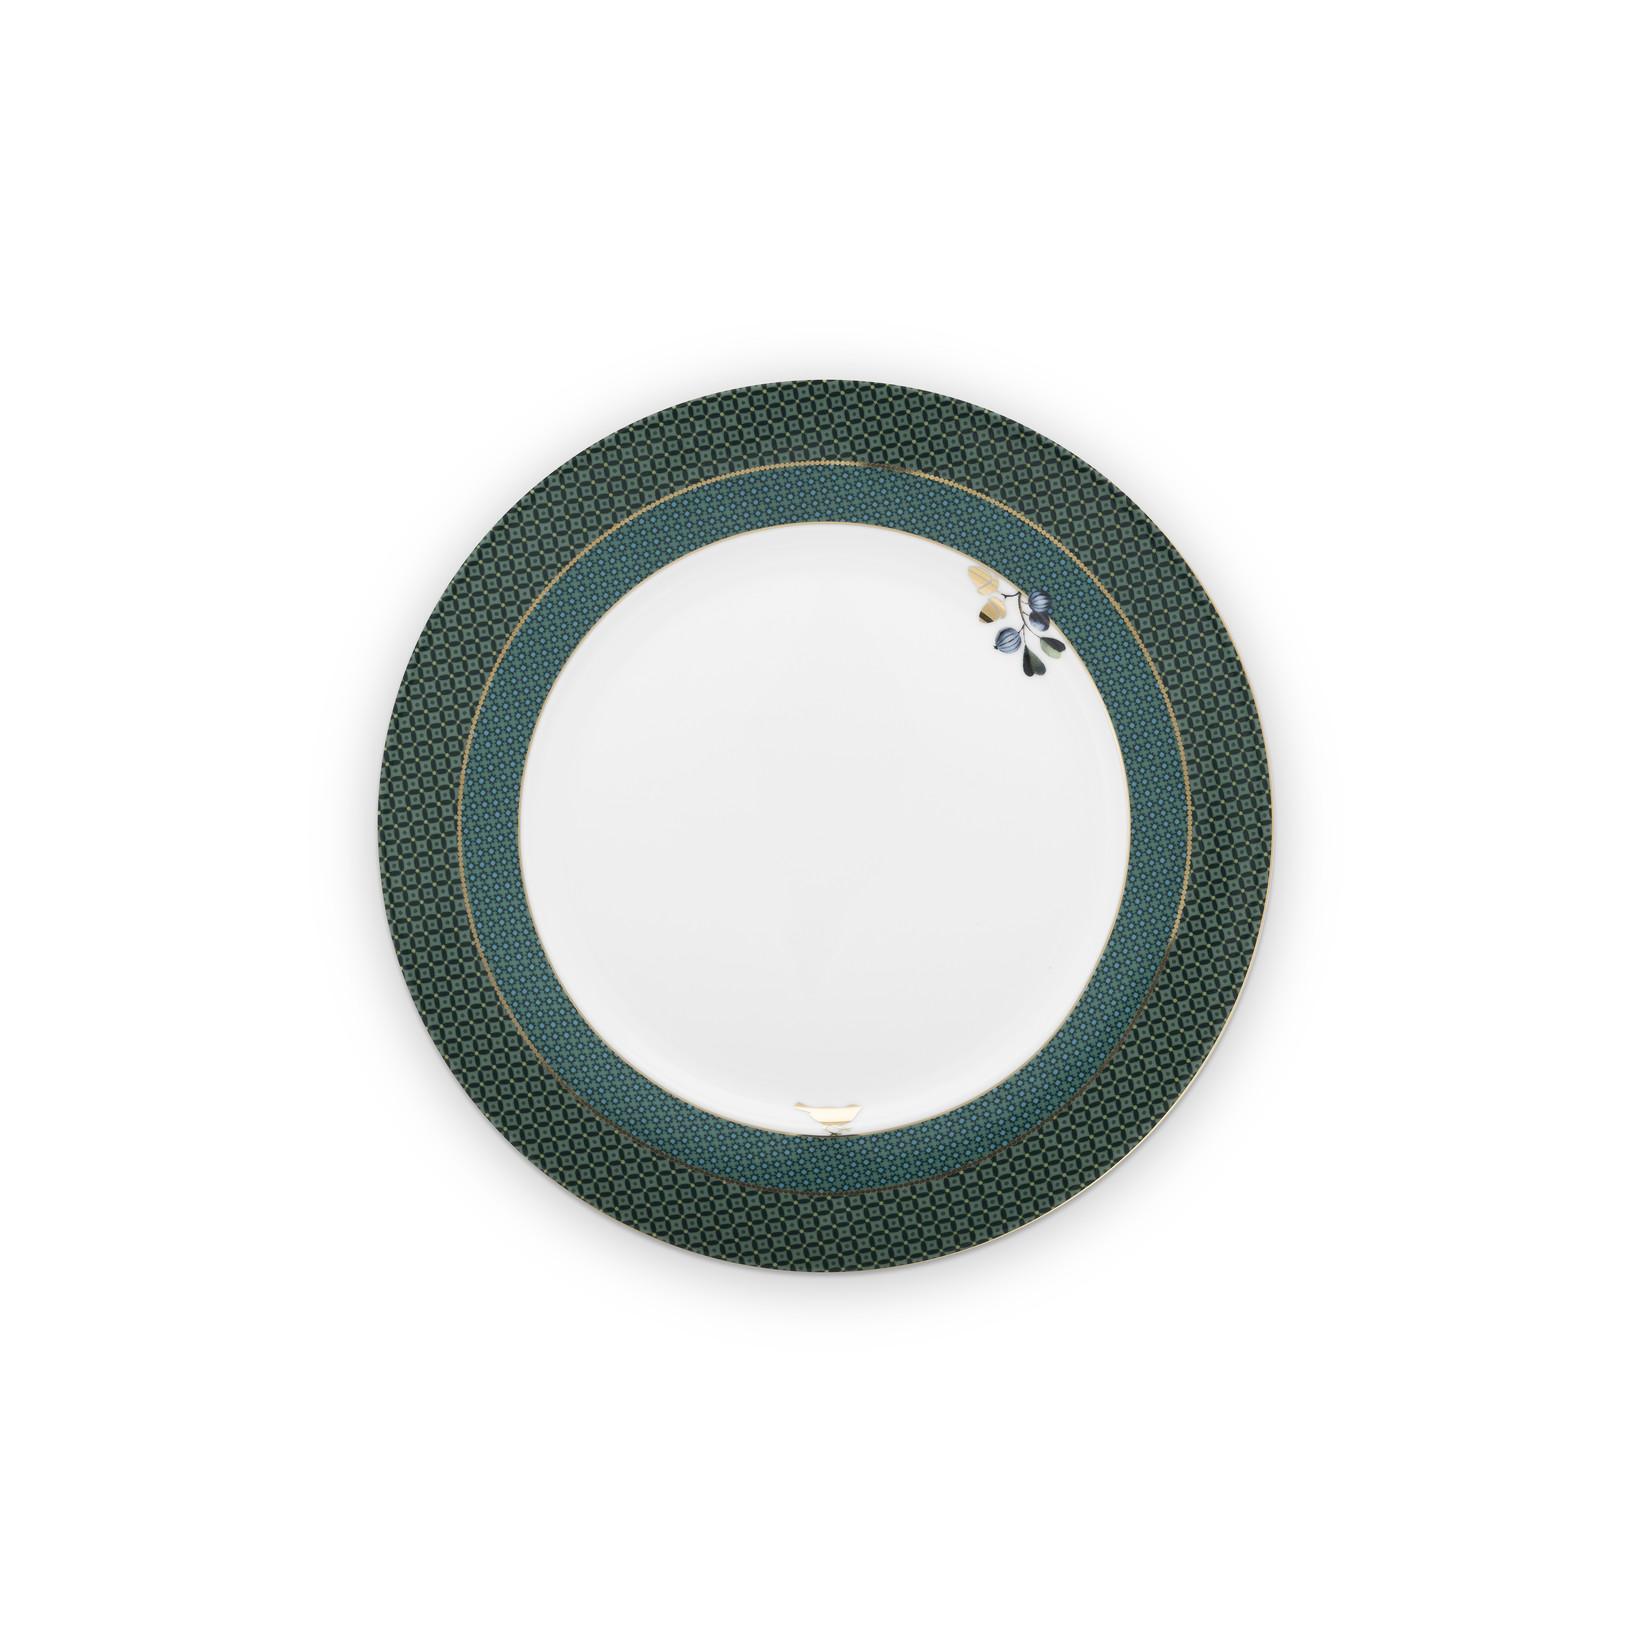 PIP Studio Plate Winter Wonderland Green 26.5cm